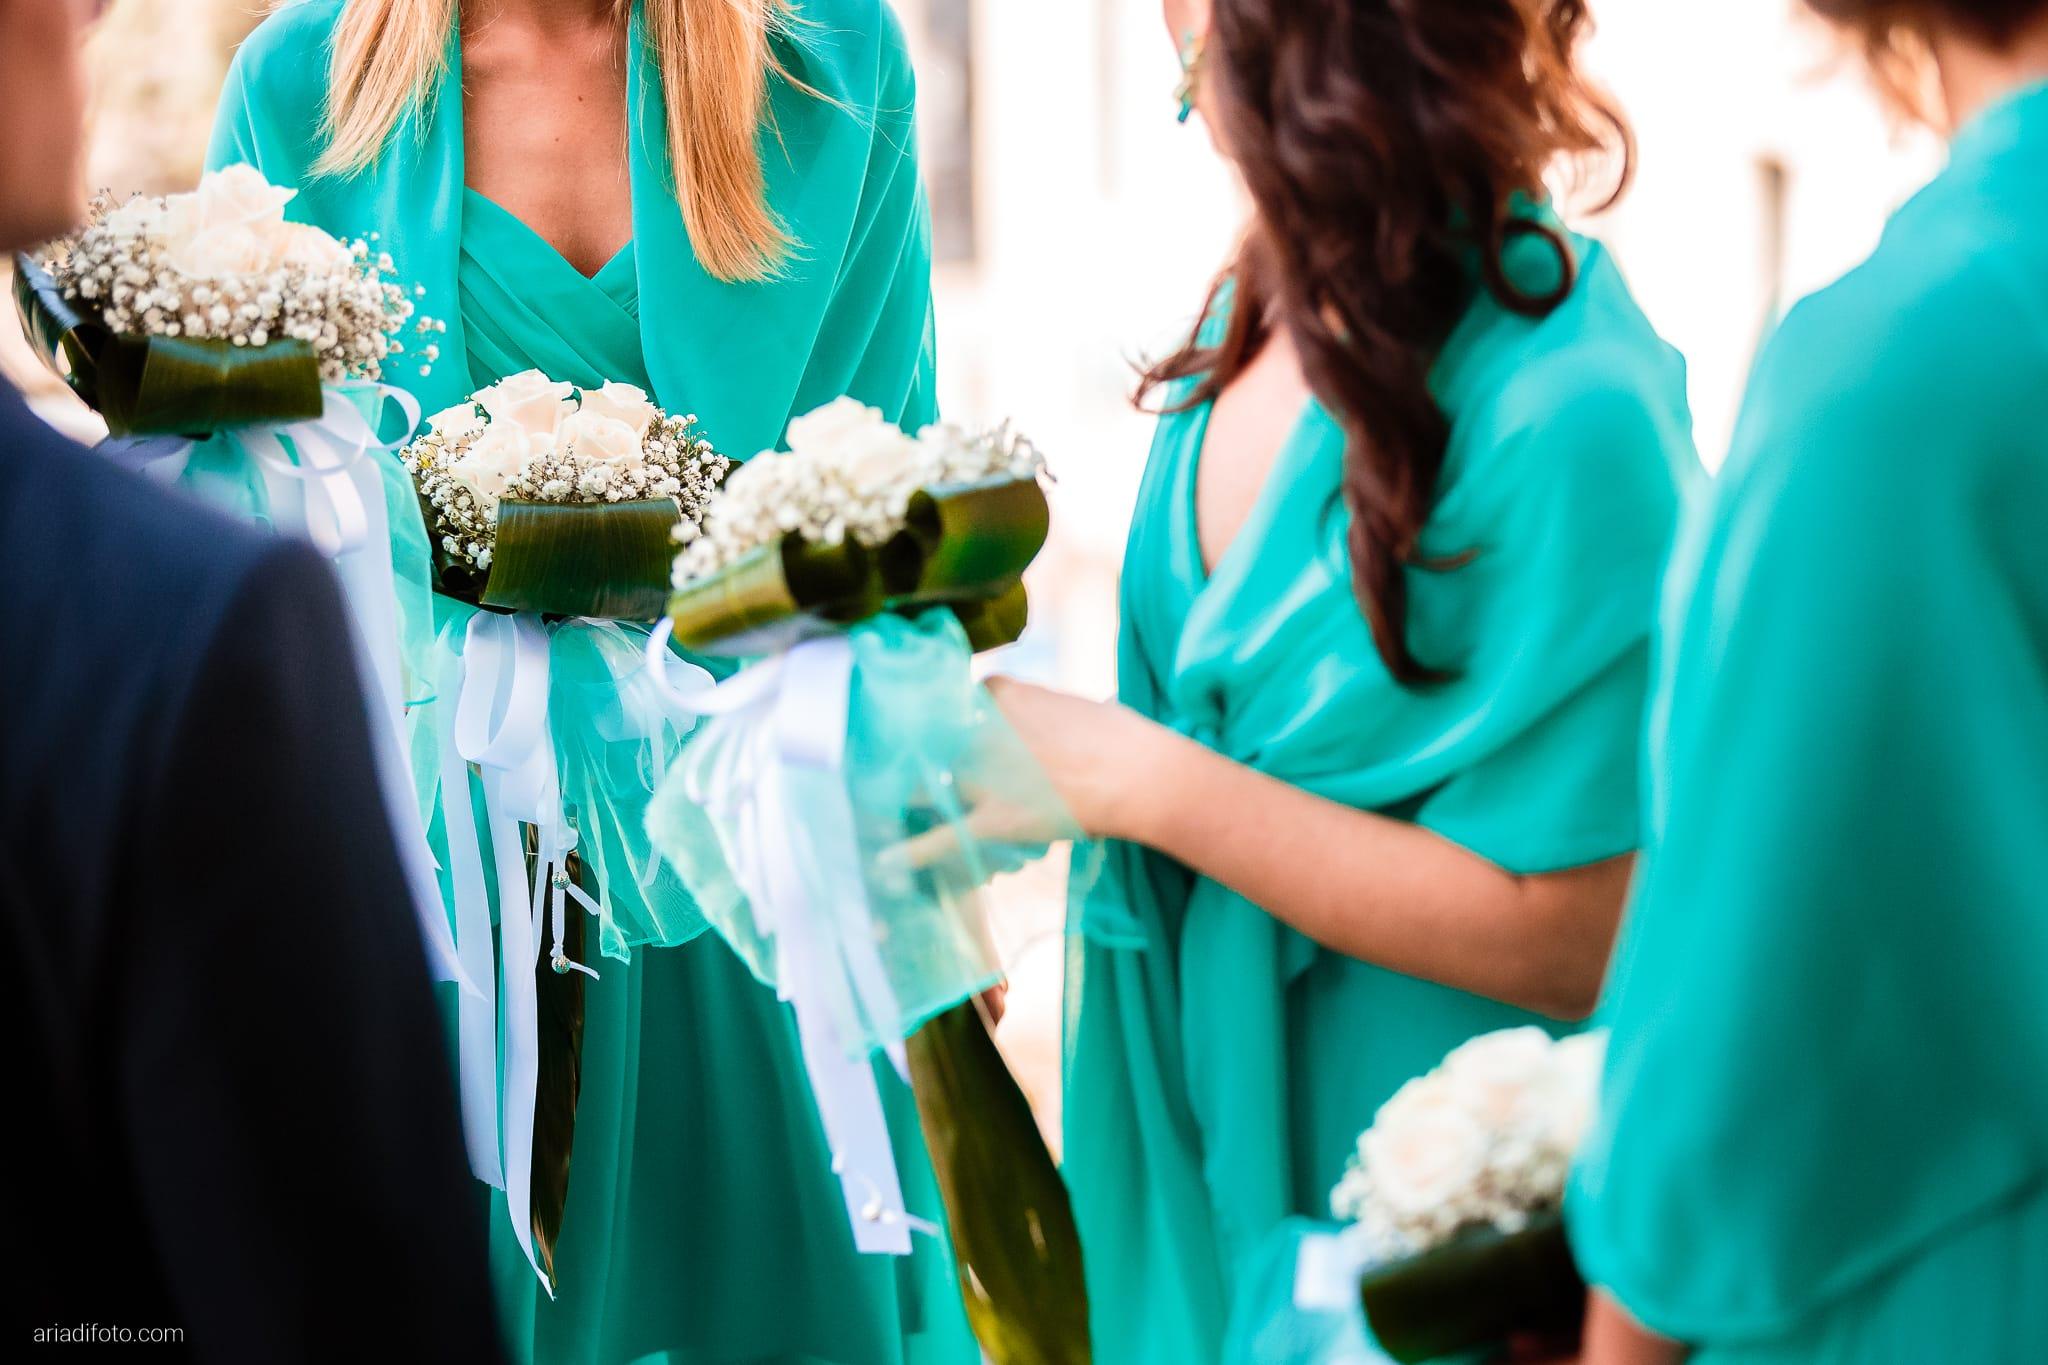 Martina Maurizio matrimonio Trieste Castello Spessa Gorizia dettagli bouquet rose damigelle